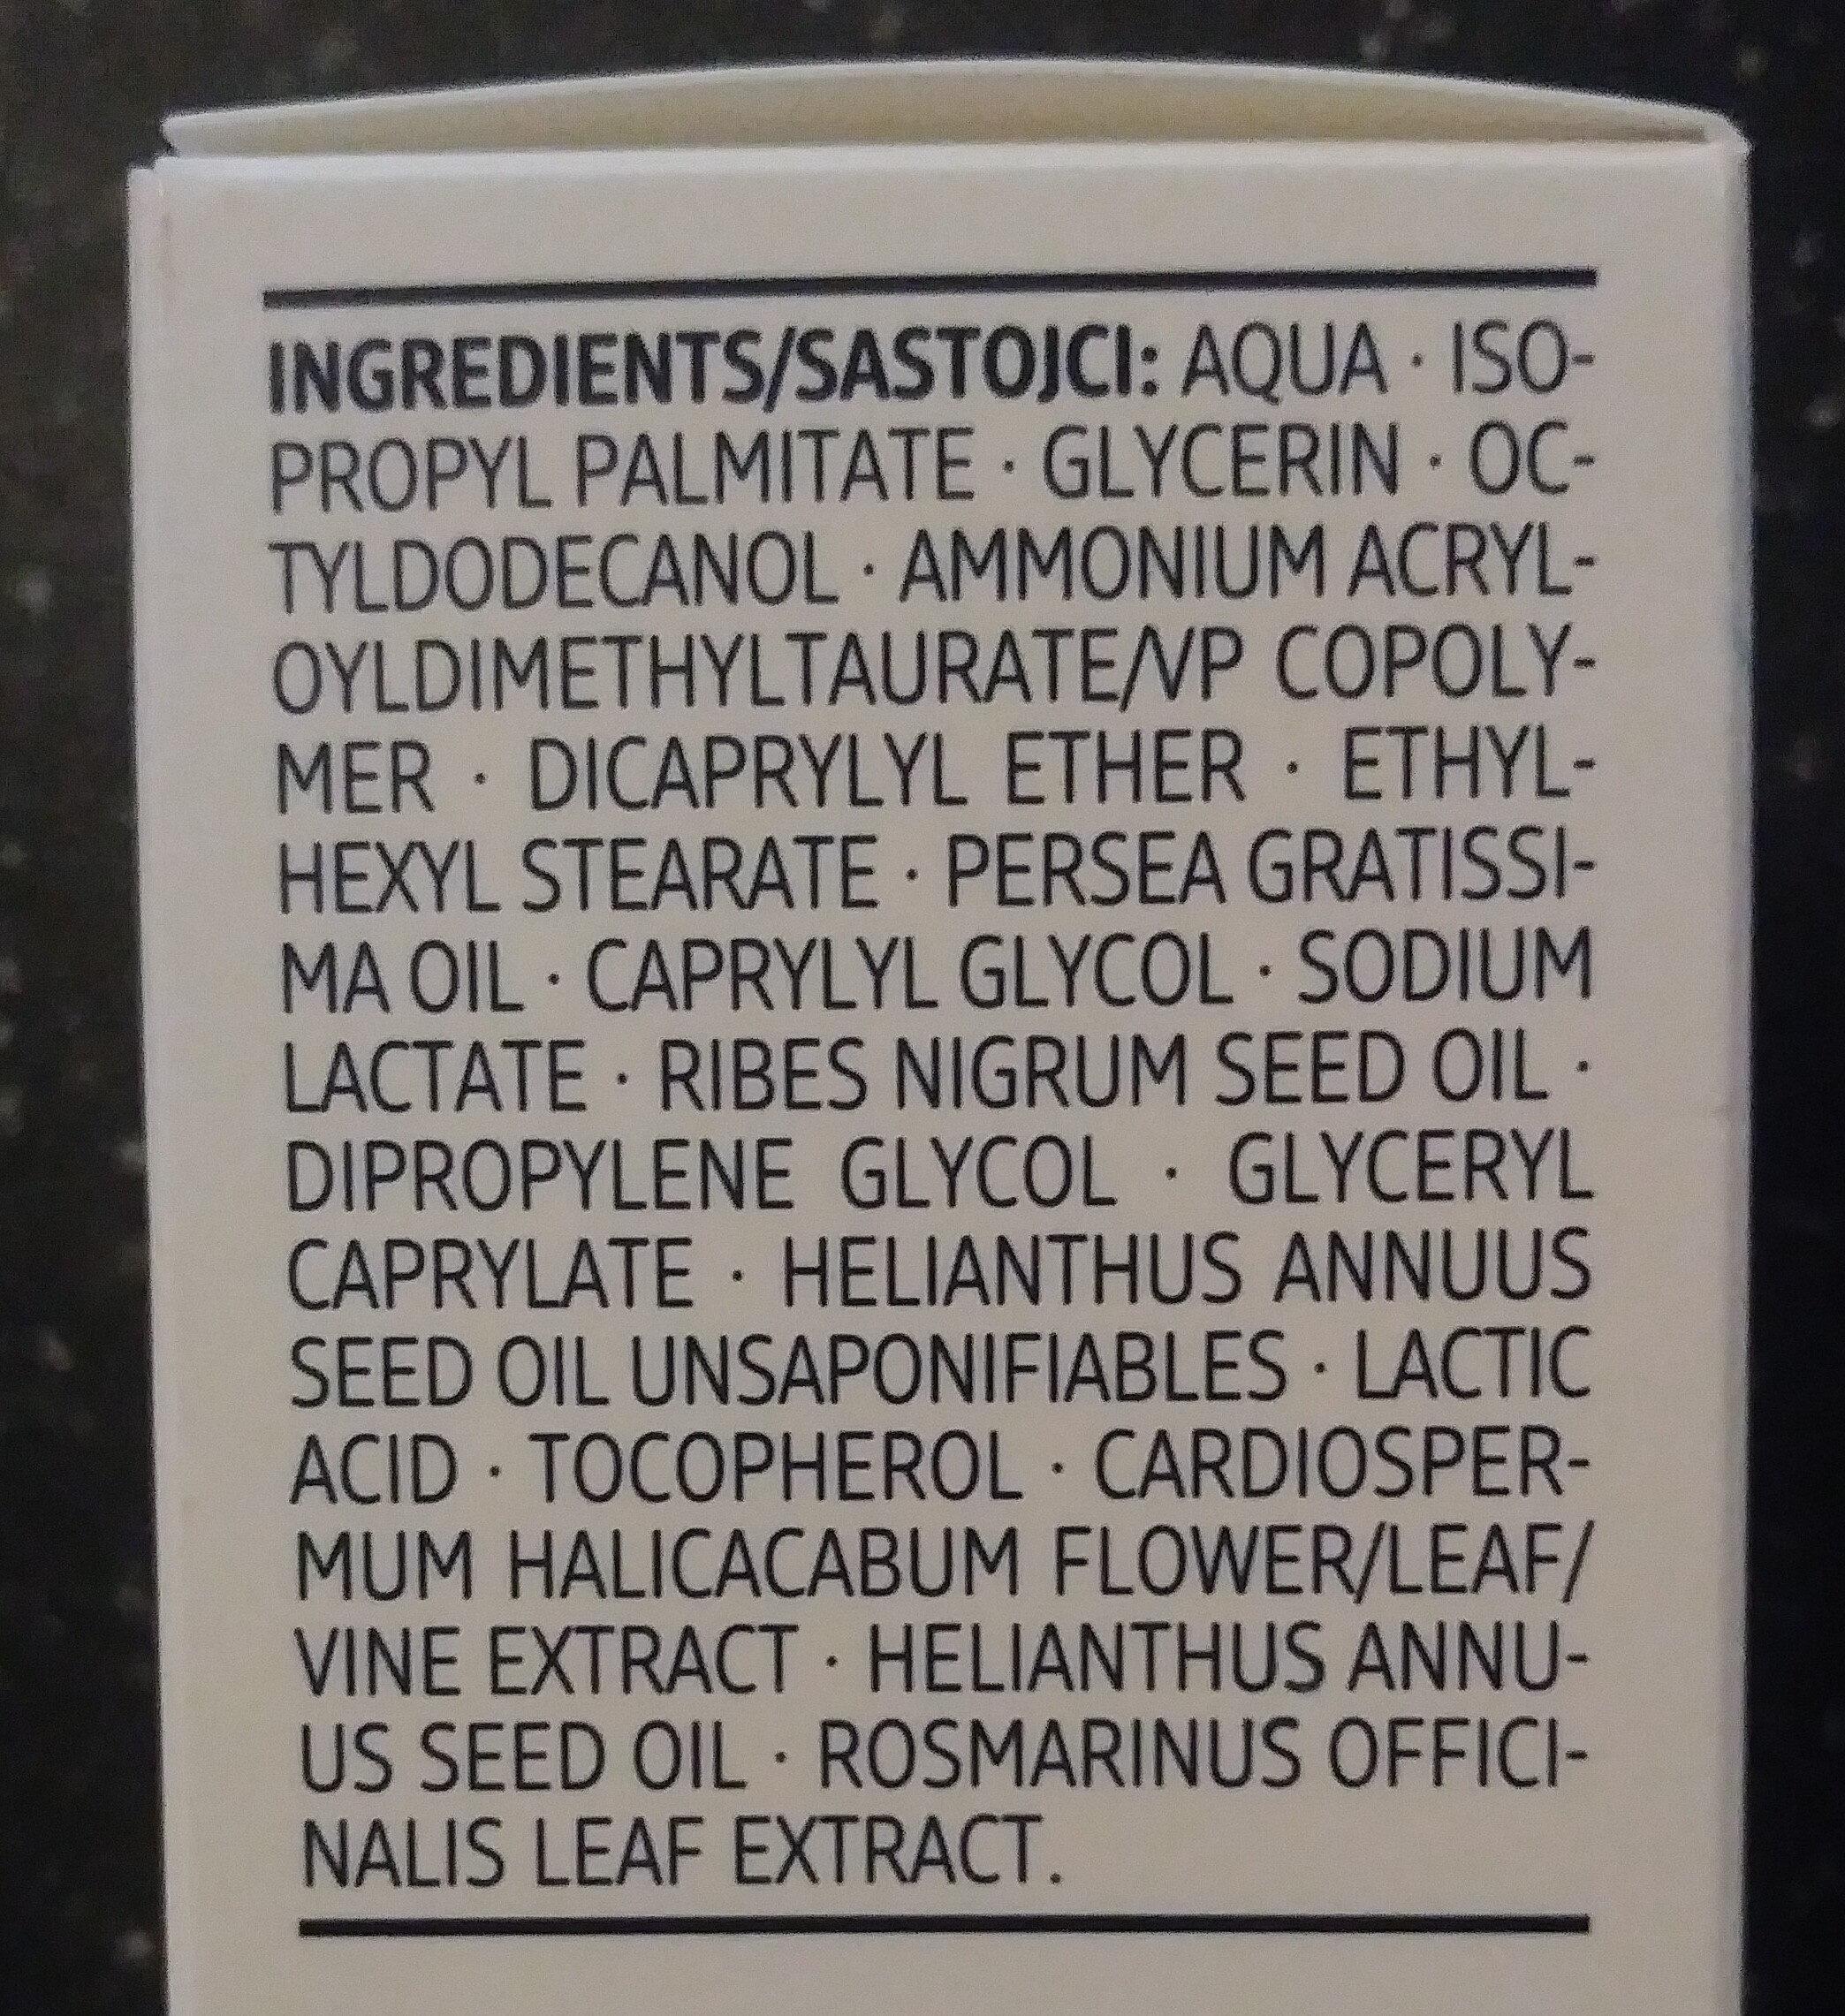 Gesichtspflege Ultra Sensitive - Ingredients - de